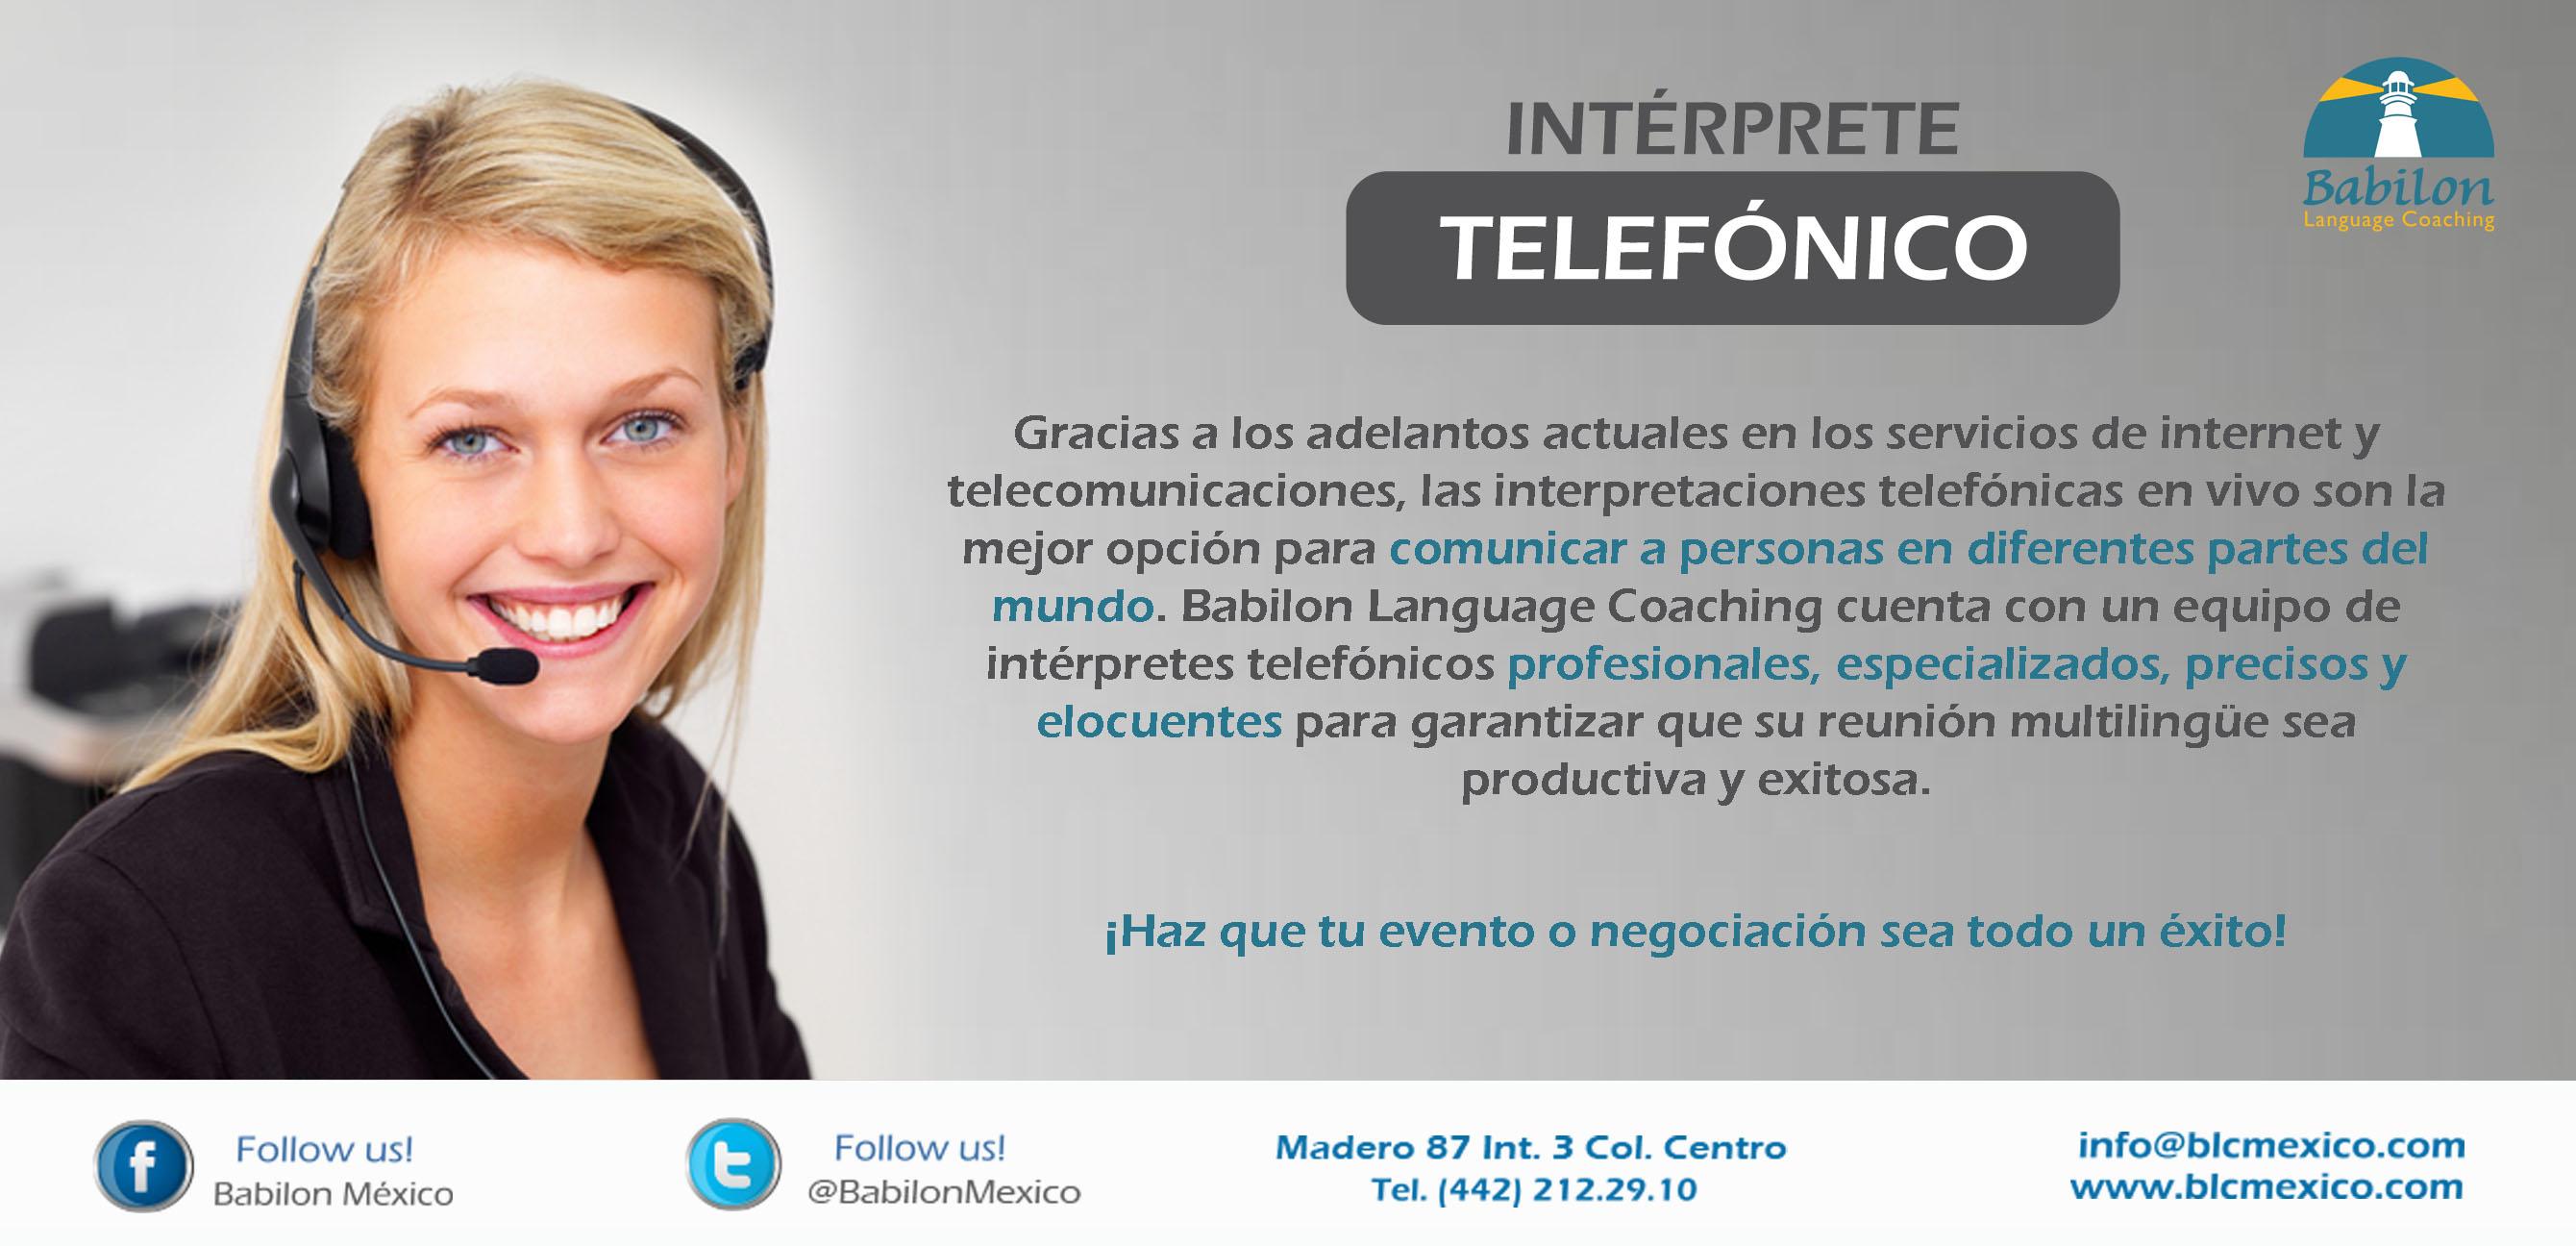 INTER TELEFONICO